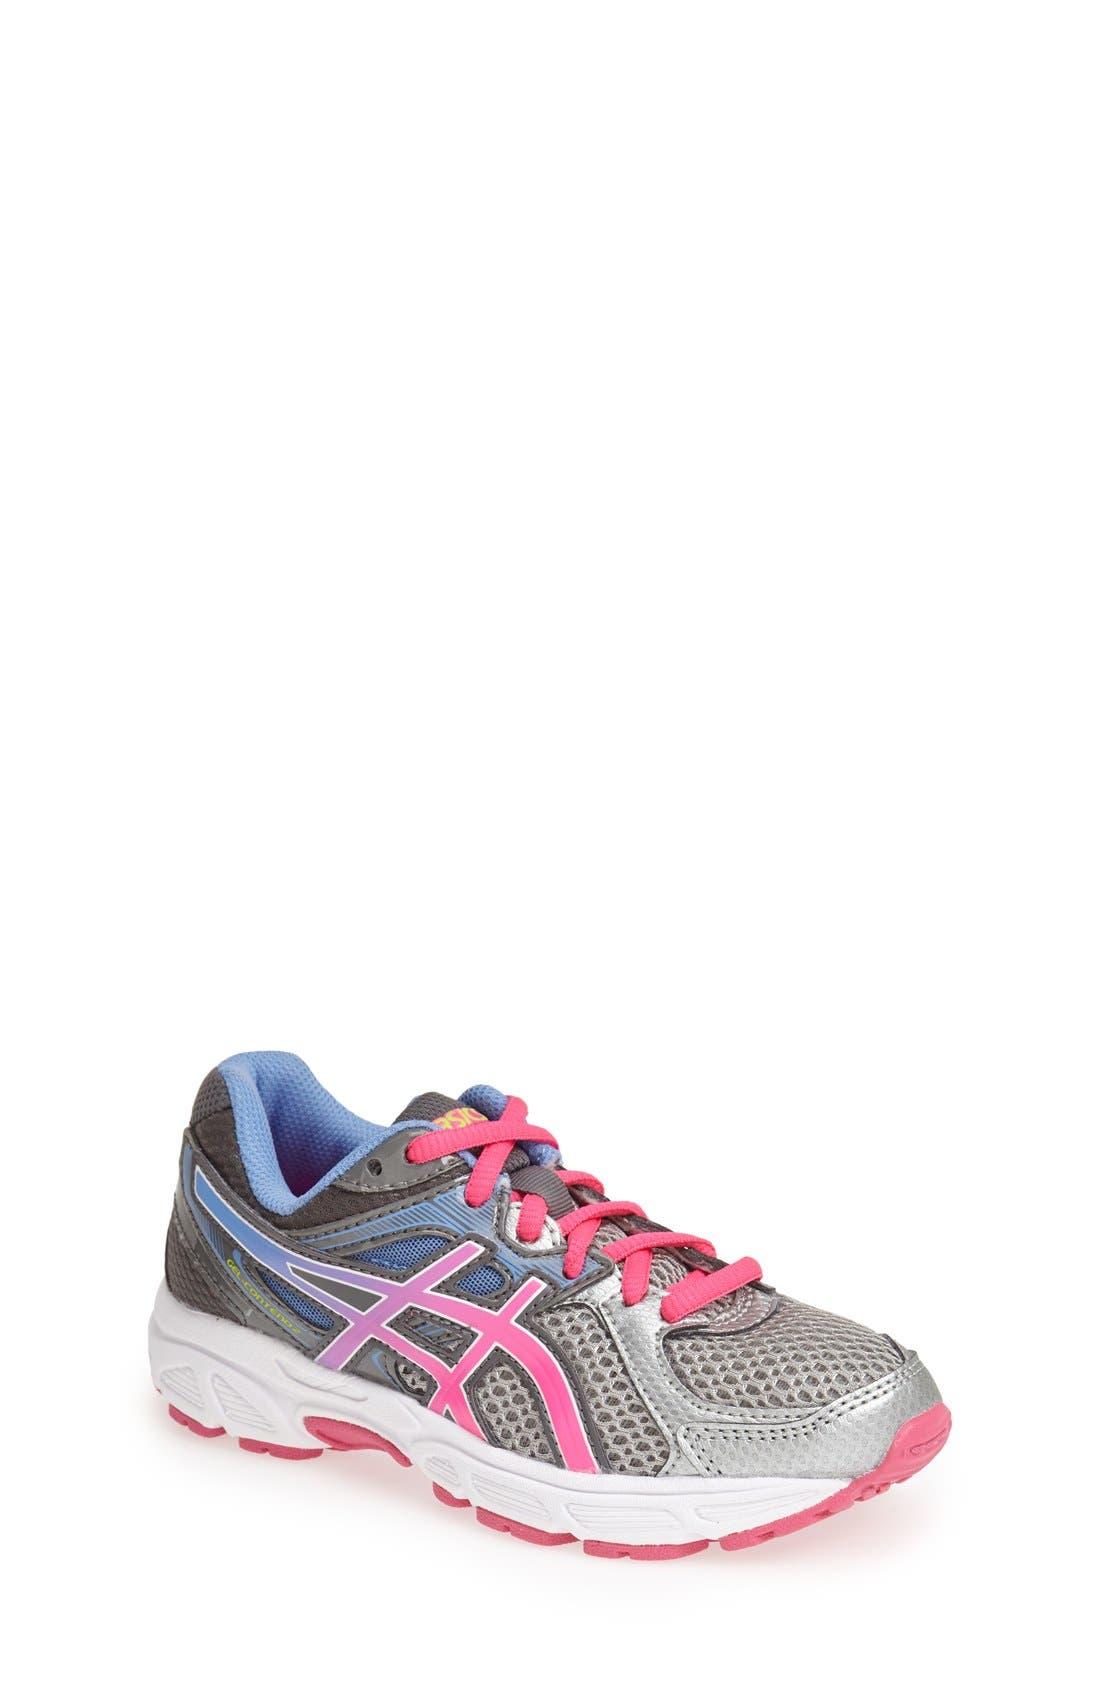 'GEL-Contend 2' Running Shoe, Main, color, 020